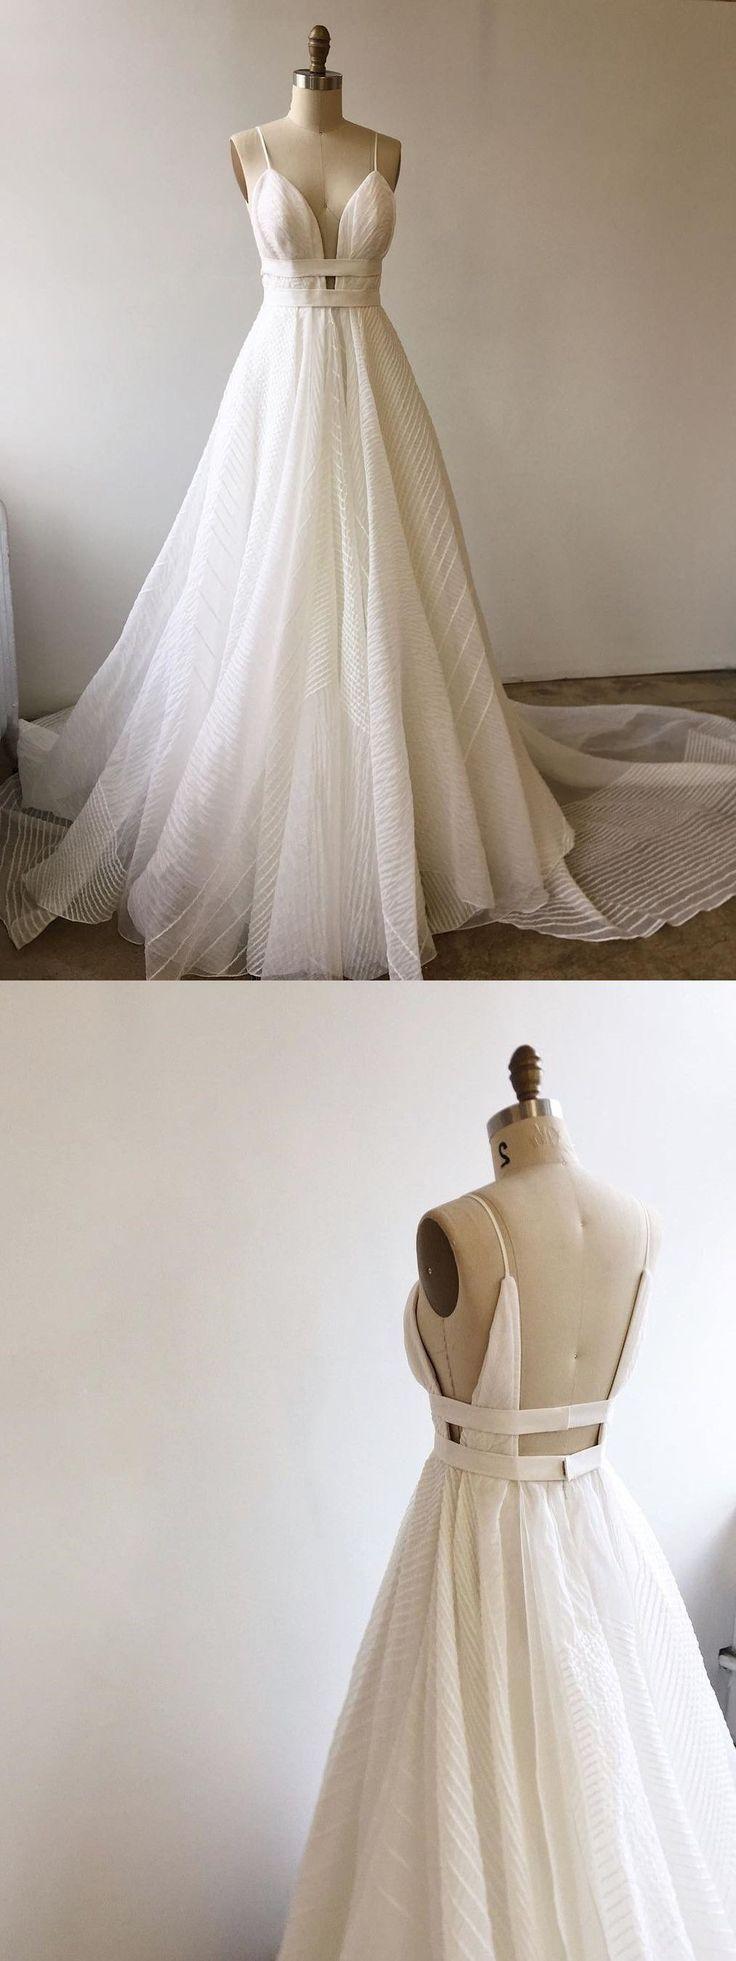 A-line Straps Long Wedding Dress, 2018 Wedding Dress, Ball Gown,White Long Wedding Dress with Train #weddingdress